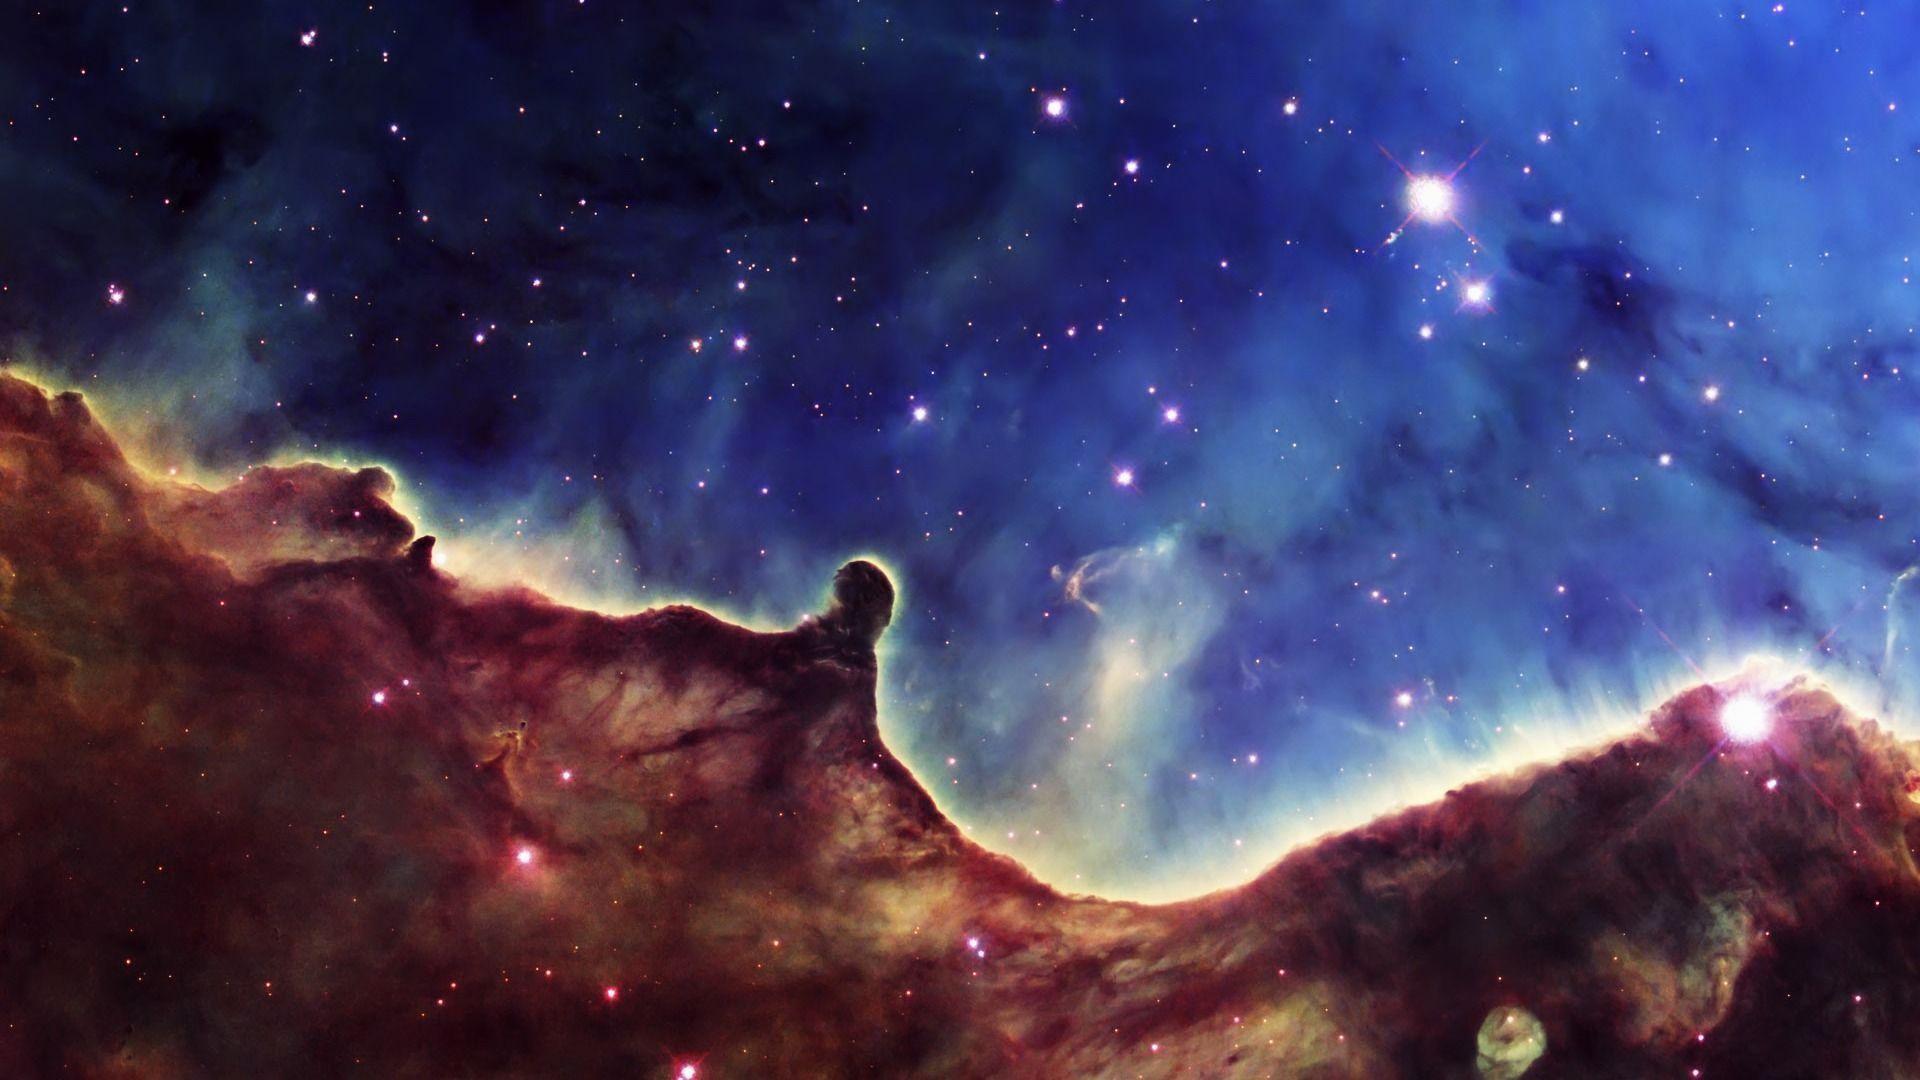 wallpaper.wiki-Hubble-Wallpapers-1920×1080-PIC-WPD002236